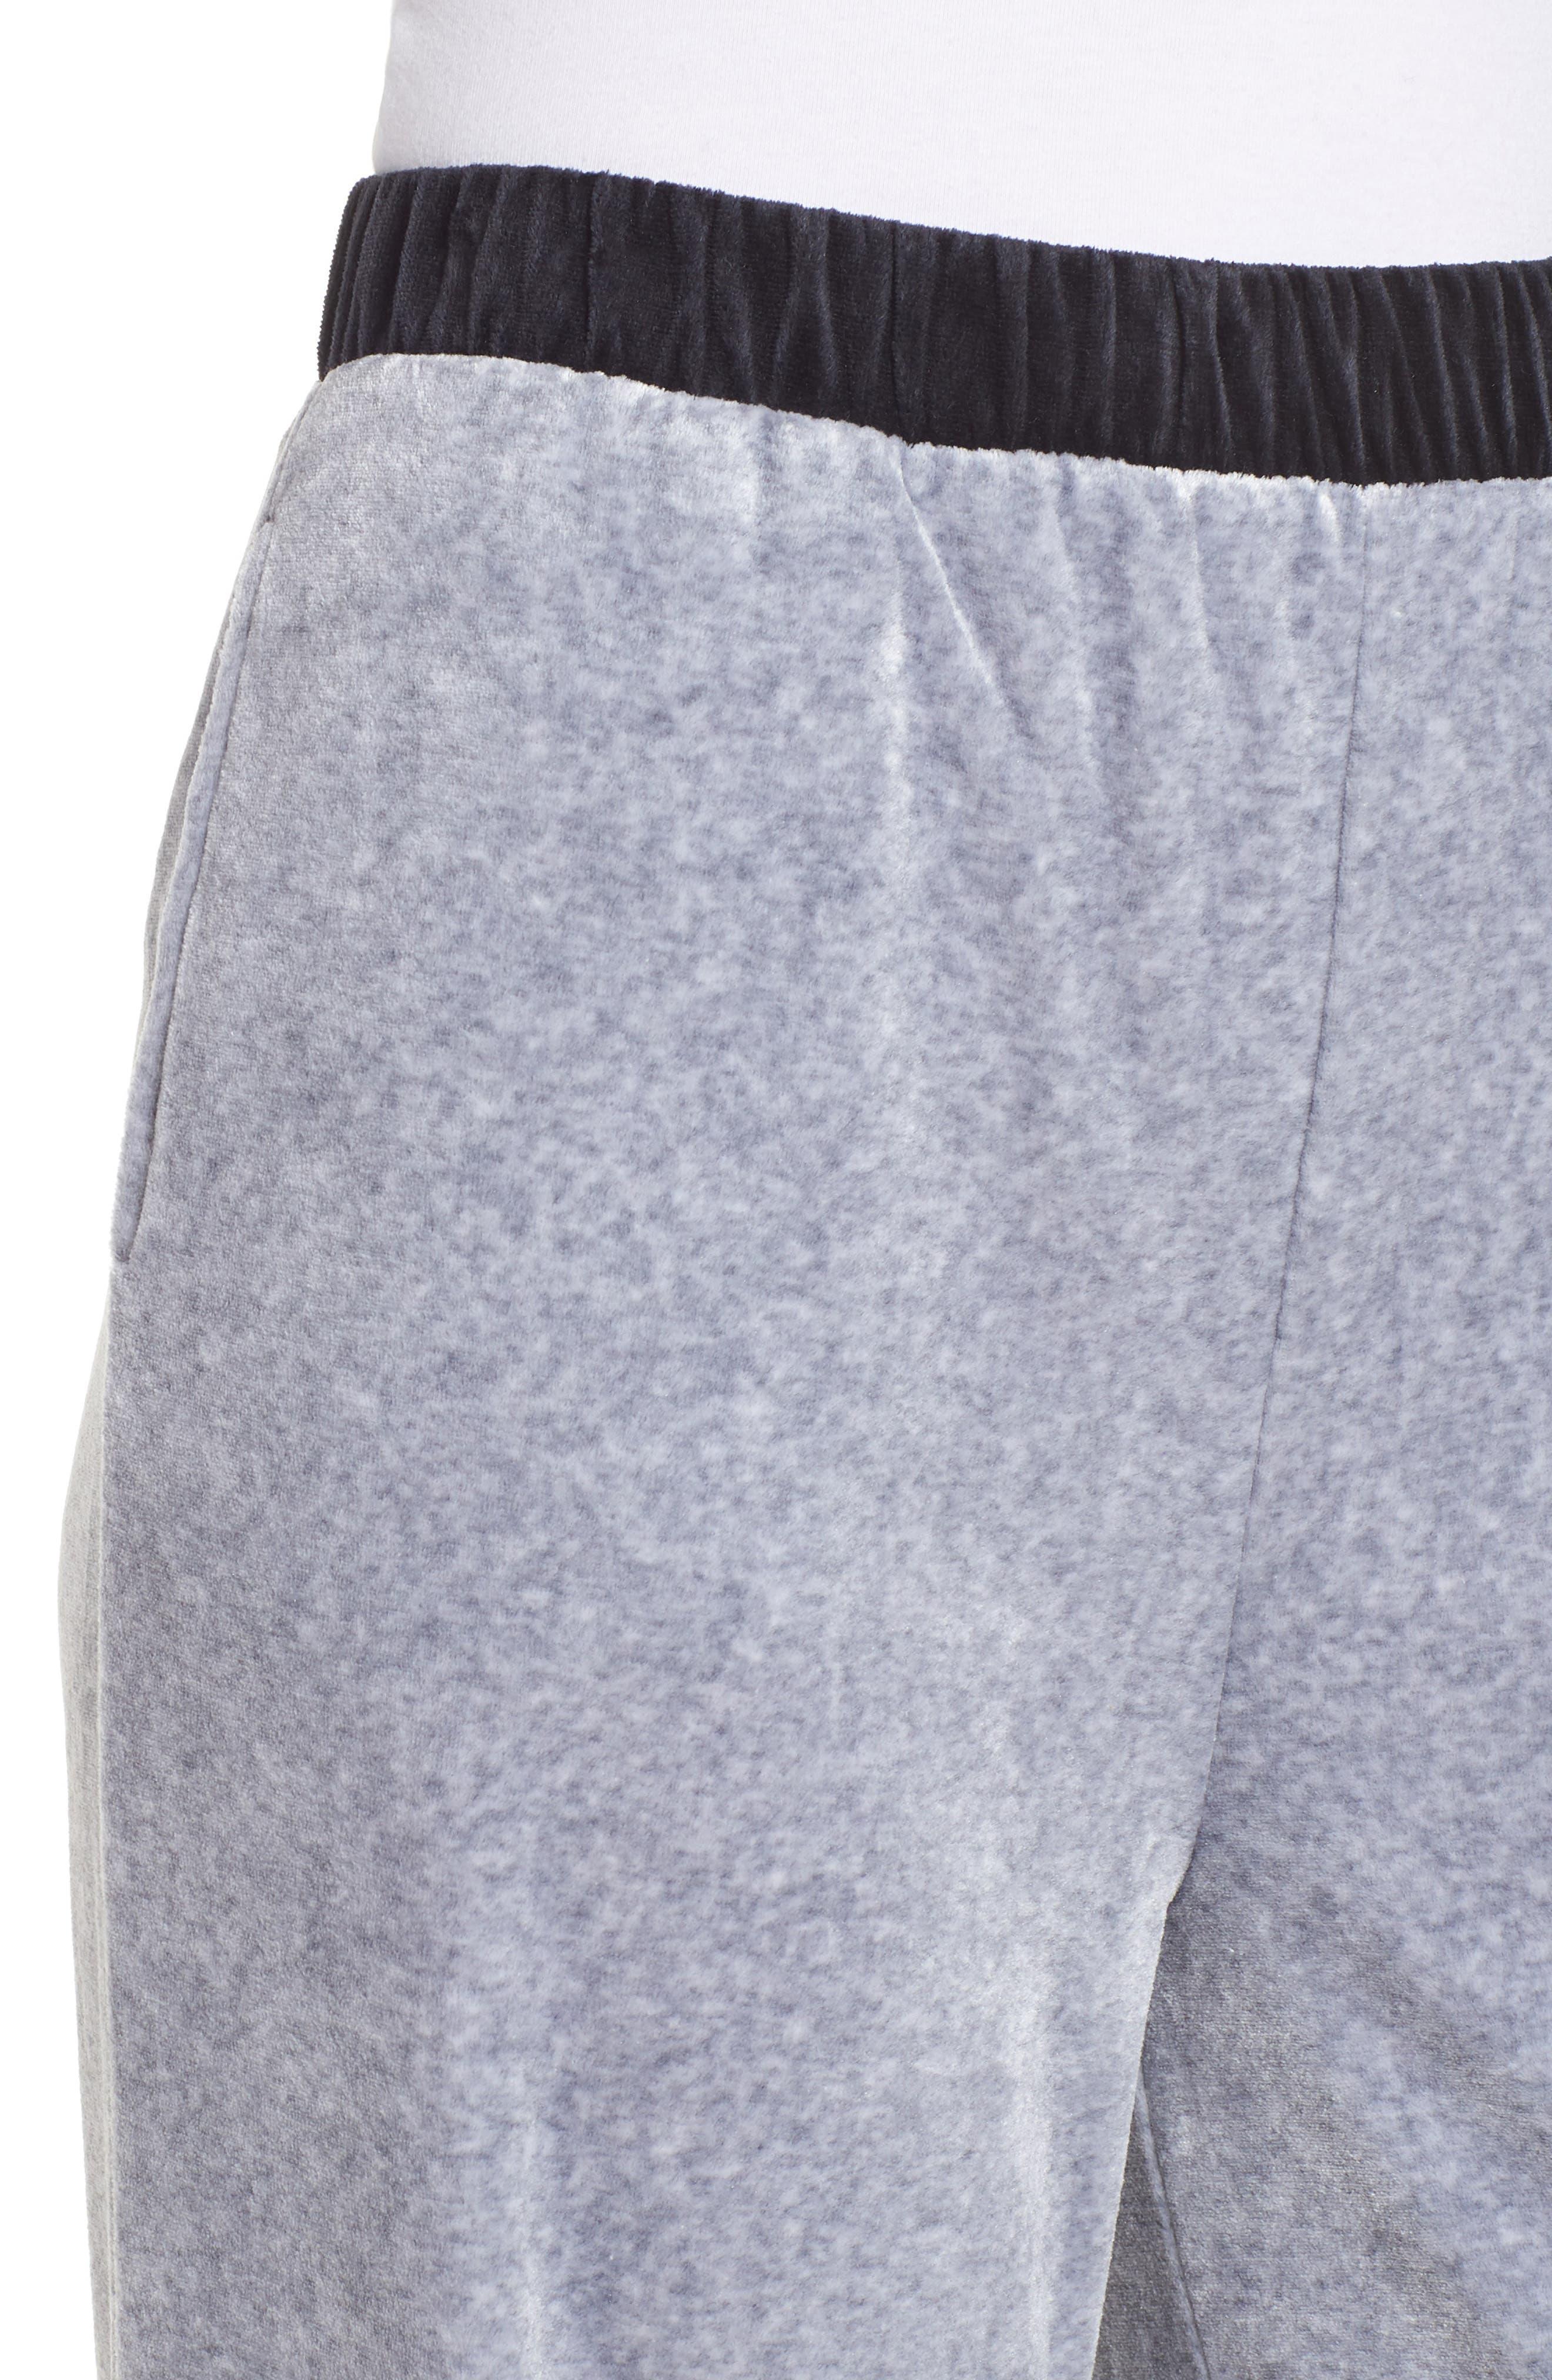 Colorblock Velour Wide Leg Pants,                             Alternate thumbnail 4, color,                             Silver Lining Angel Combo